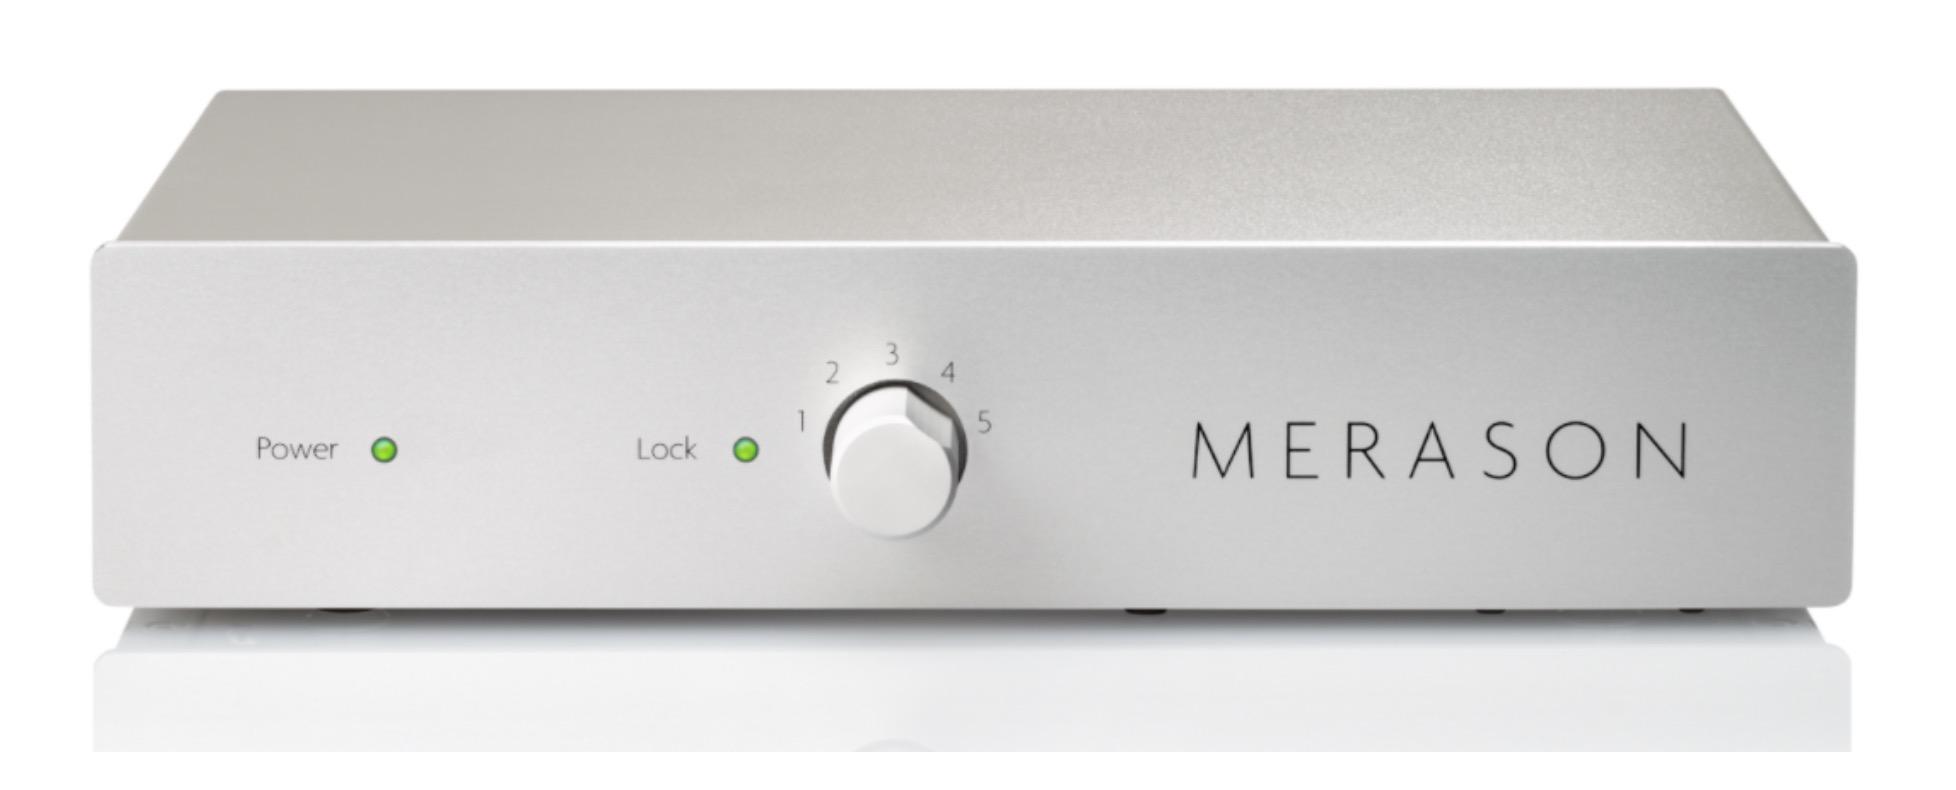 Astonishing Merason Frerot DAC. Modest Price. Monster Performance. Now at True Audiophile.